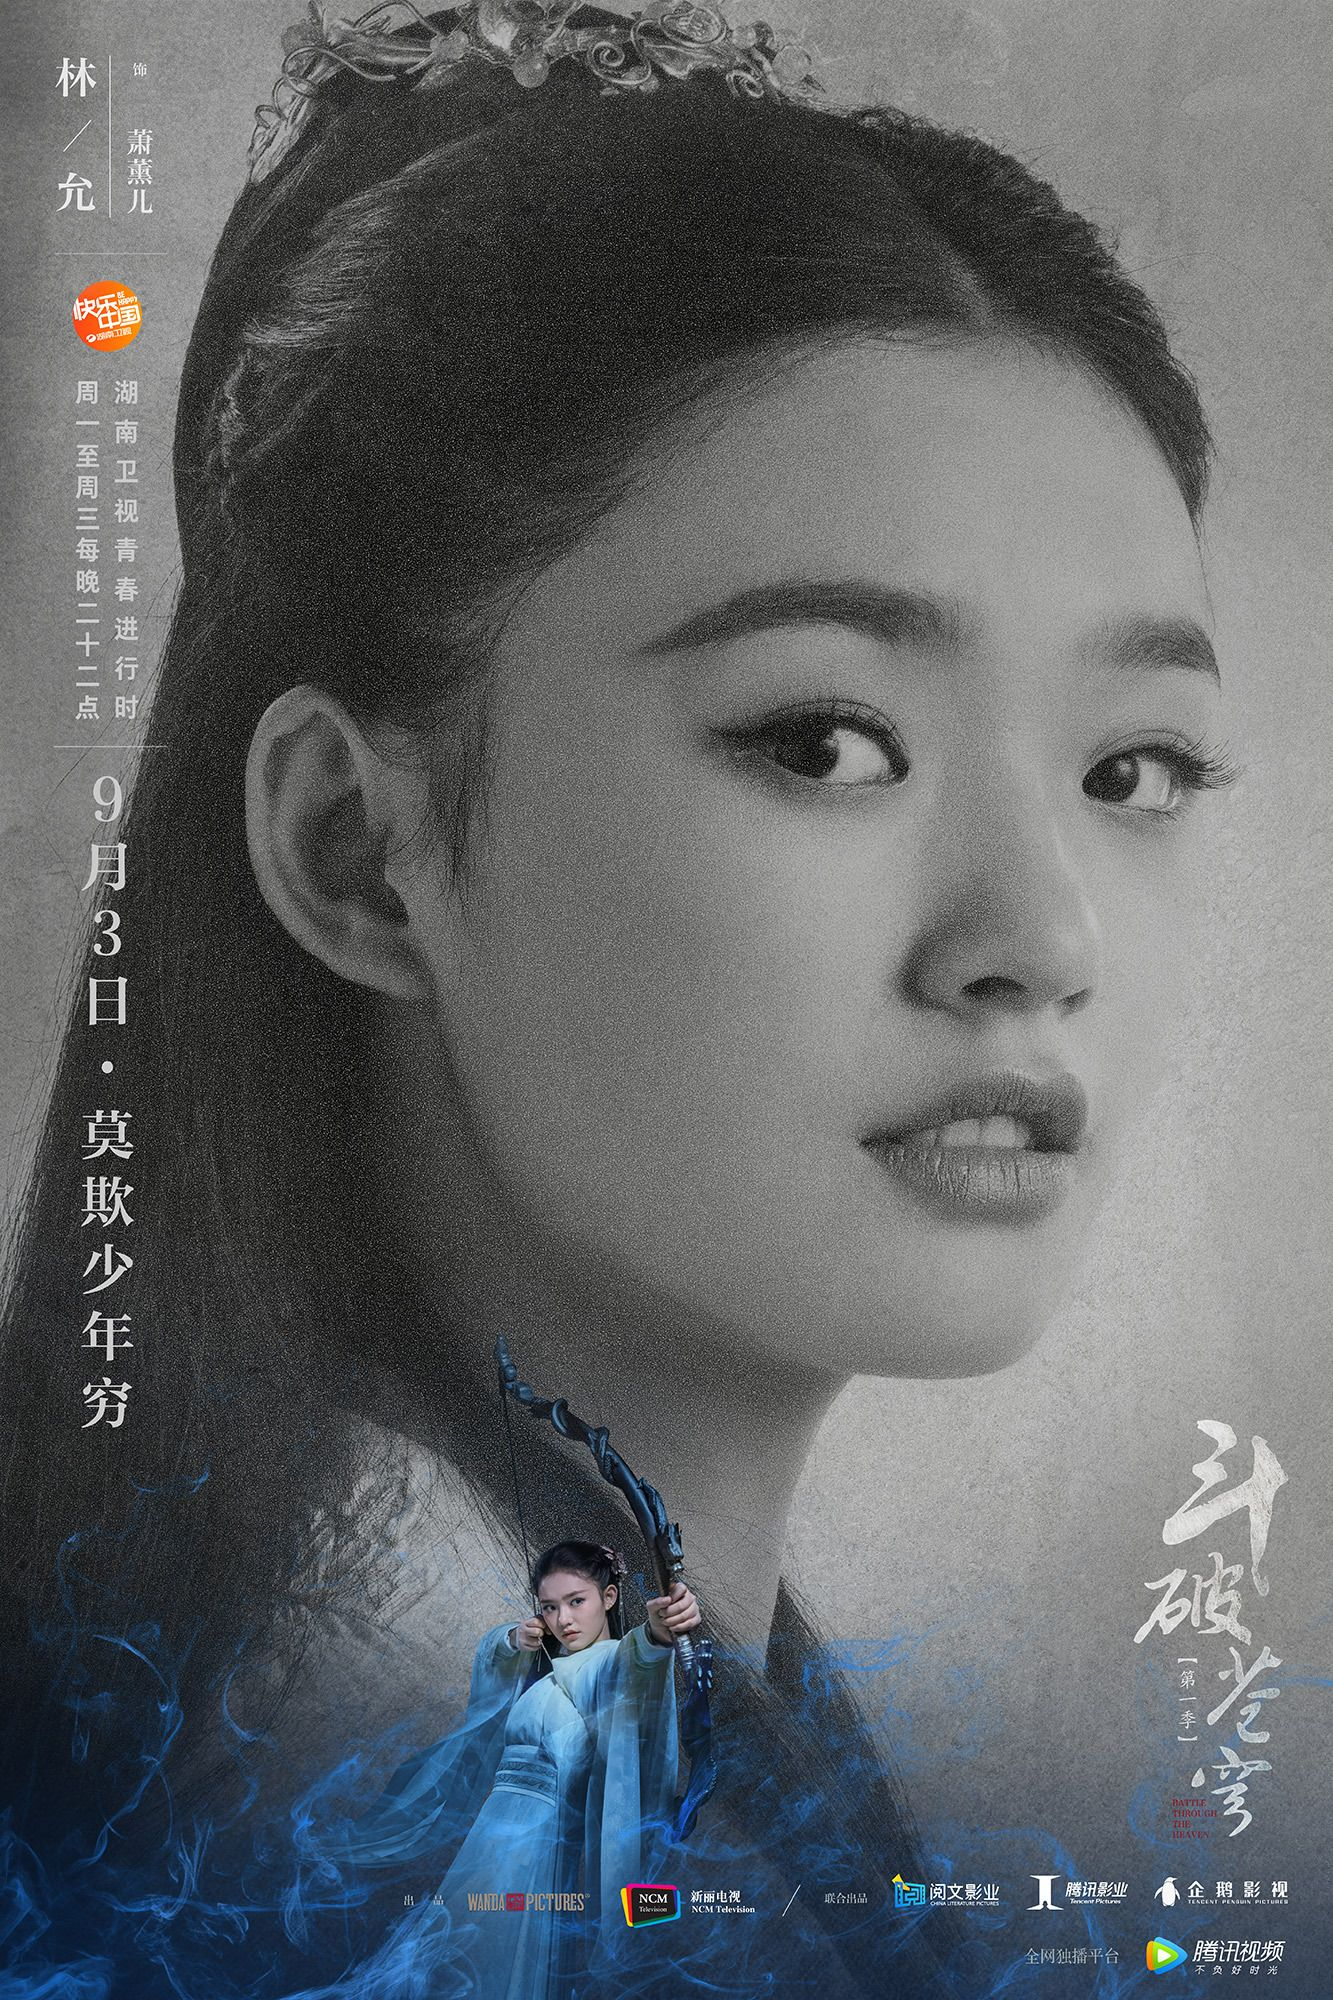 斗破苍穹 - Fights Break Sphere [September 3, 2018   Chinese